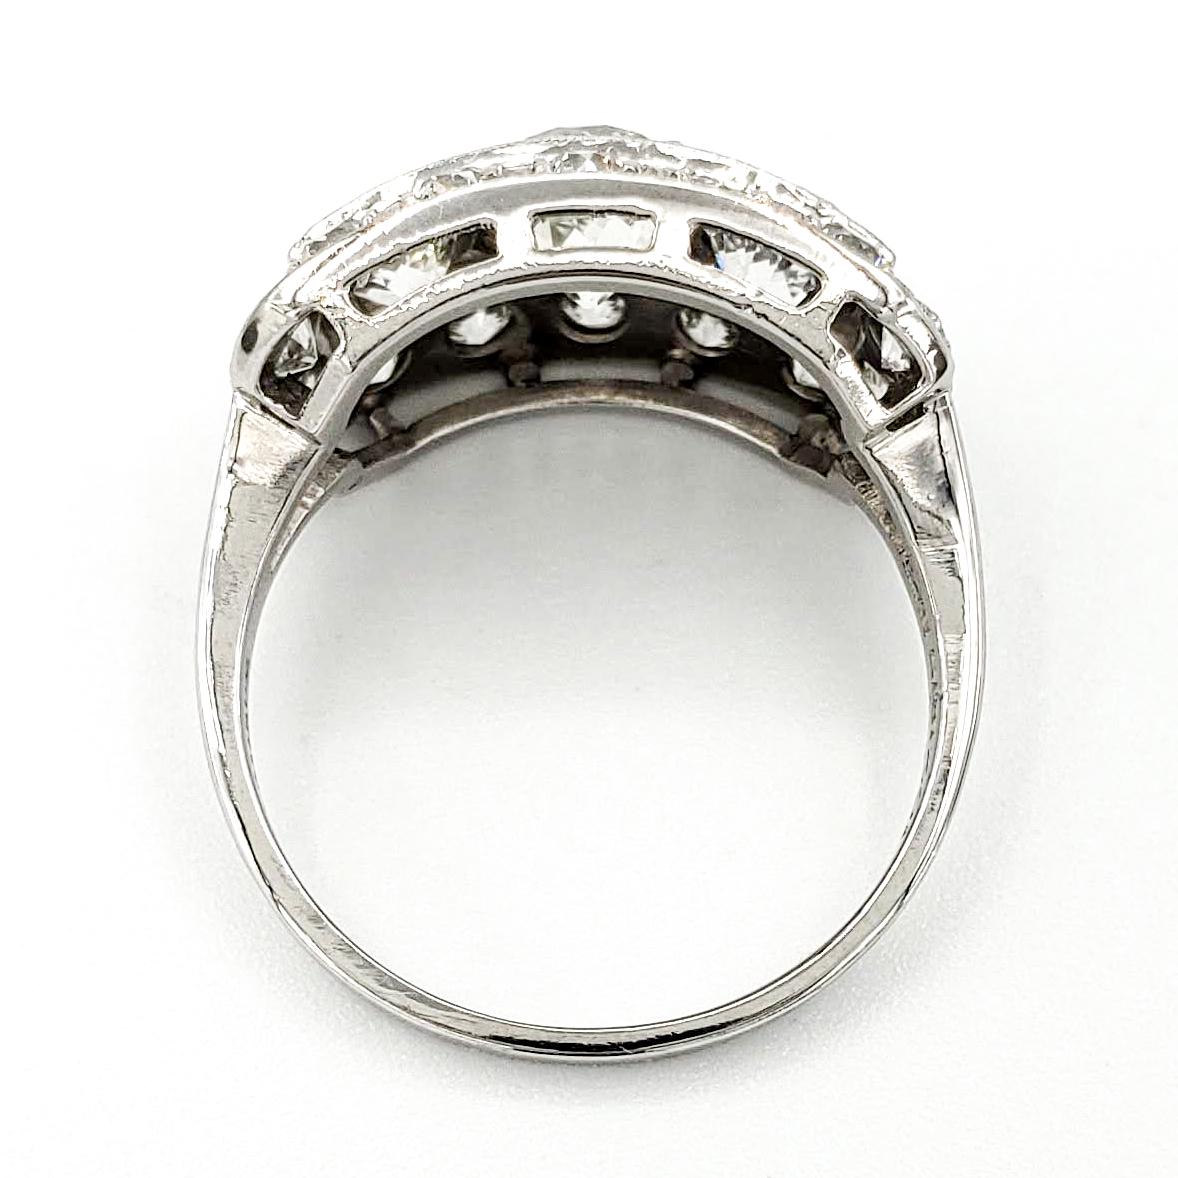 Vintage Platinum Engagement Ring With 1.01 Carat Old European Cut Diamond EGL - K VS1